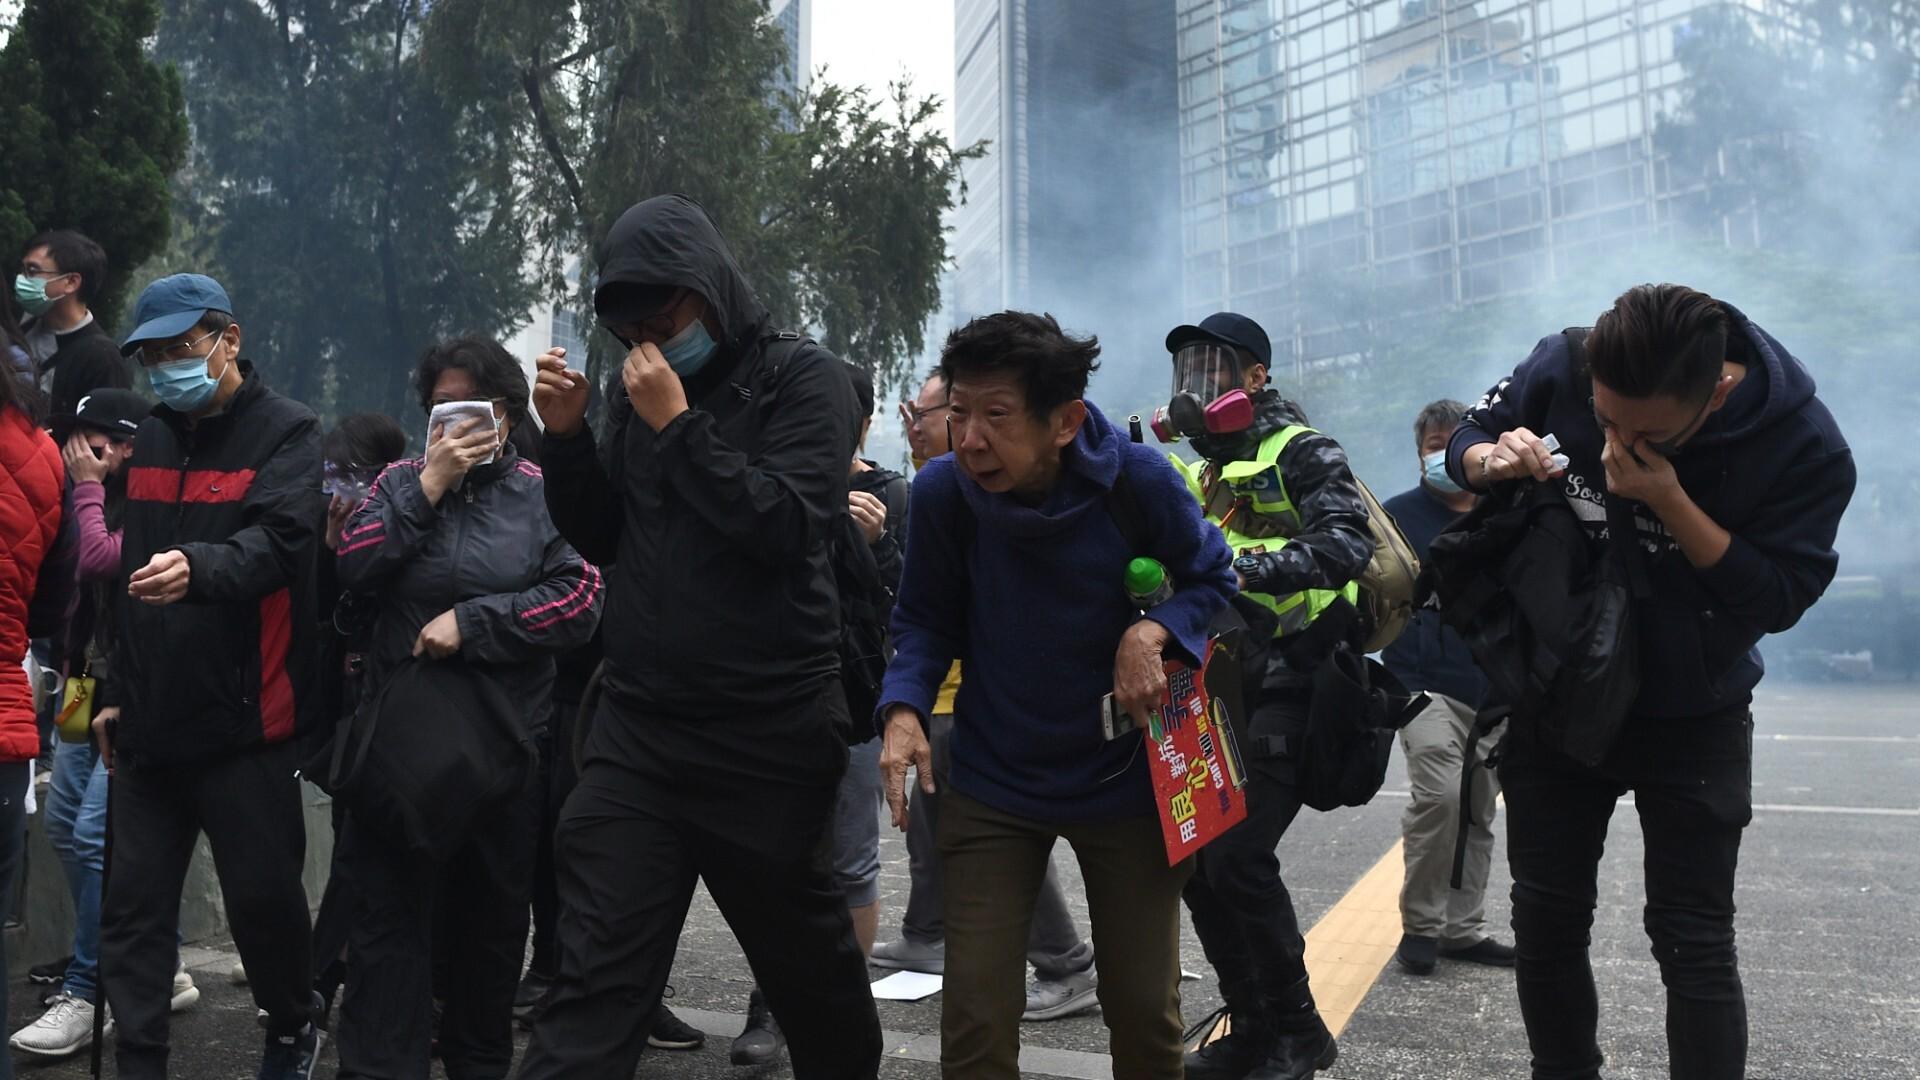 Hong Kong protests: Several arrested as demonstrators defy ban